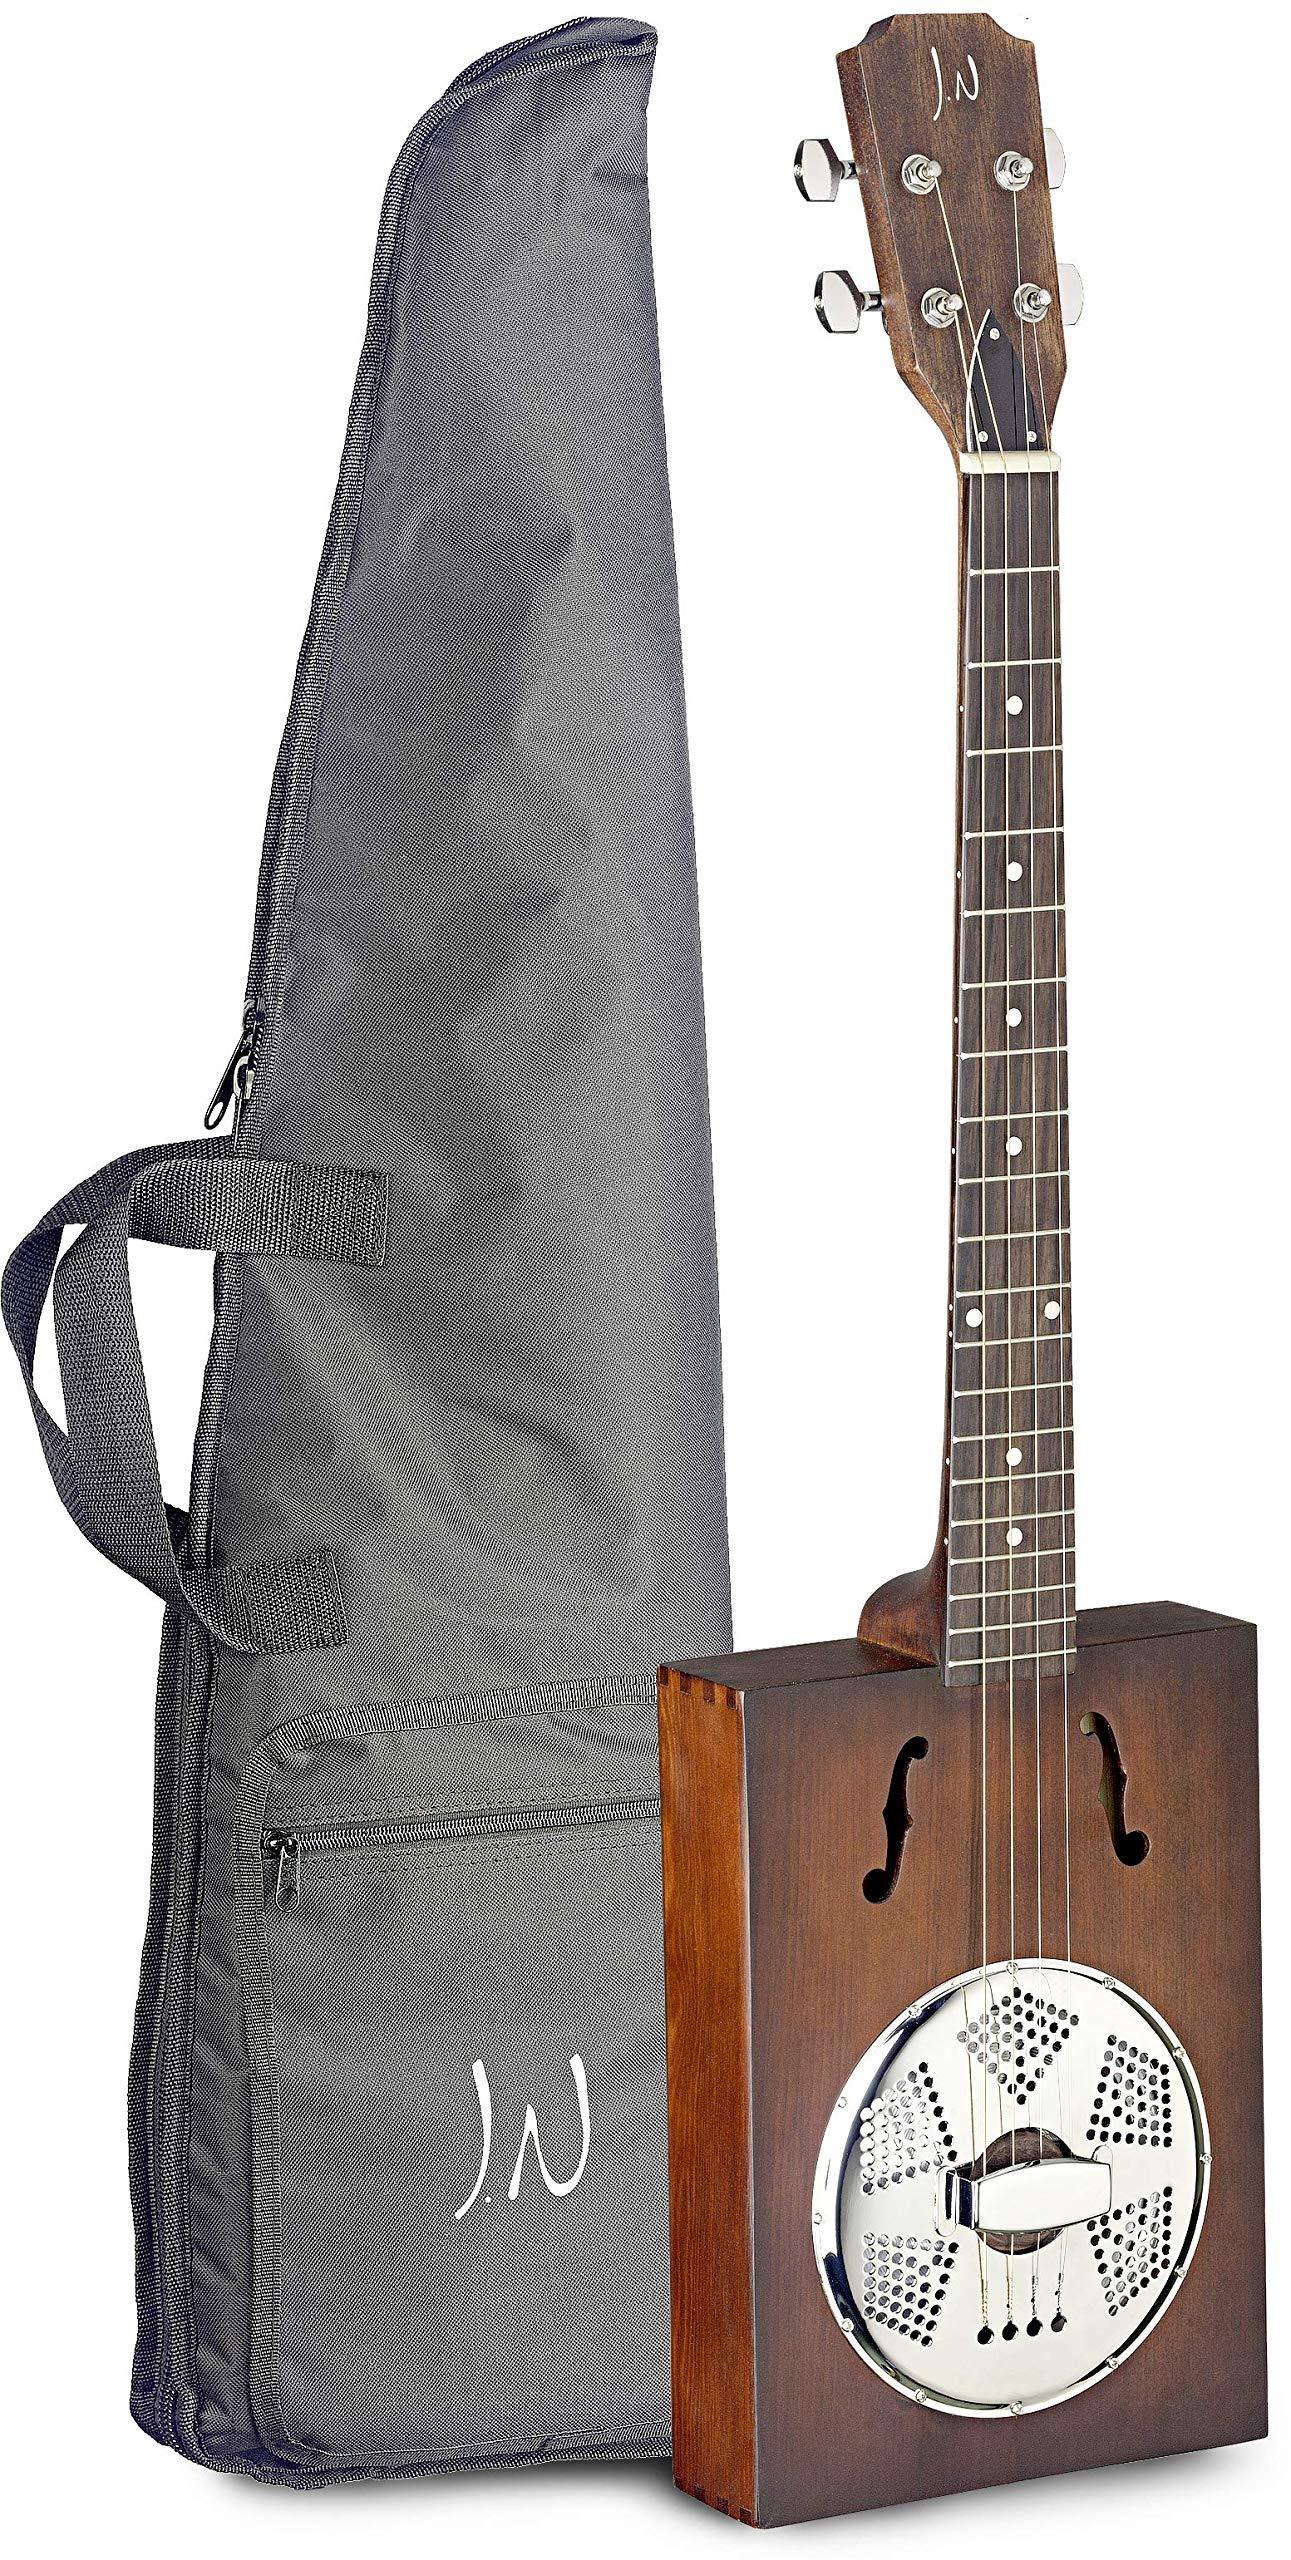 J.N. Guitars 4 String Resonator Guitar Right (CASK-PUNCHEON-1 by J.N. Guitars